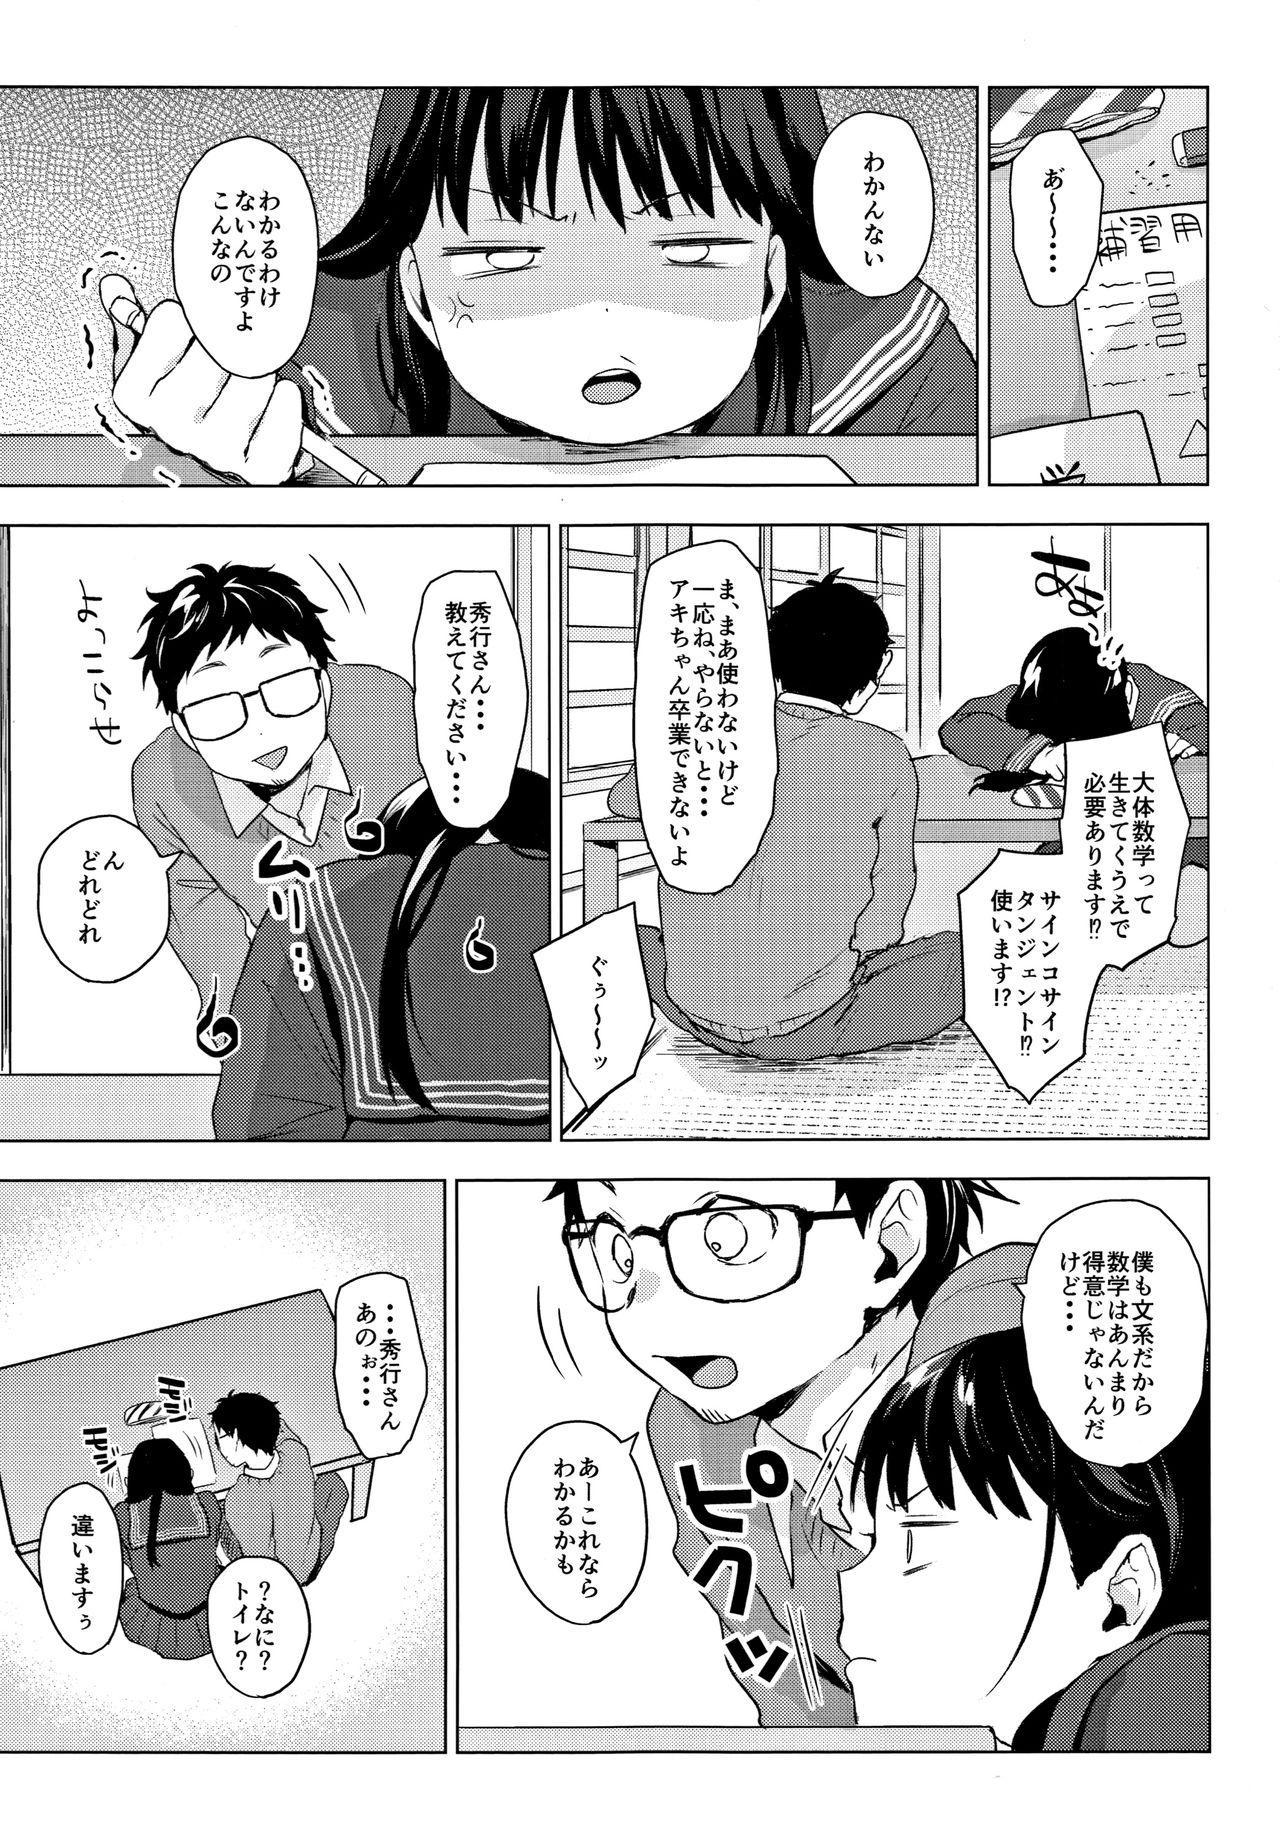 SUKI ATSUME 207